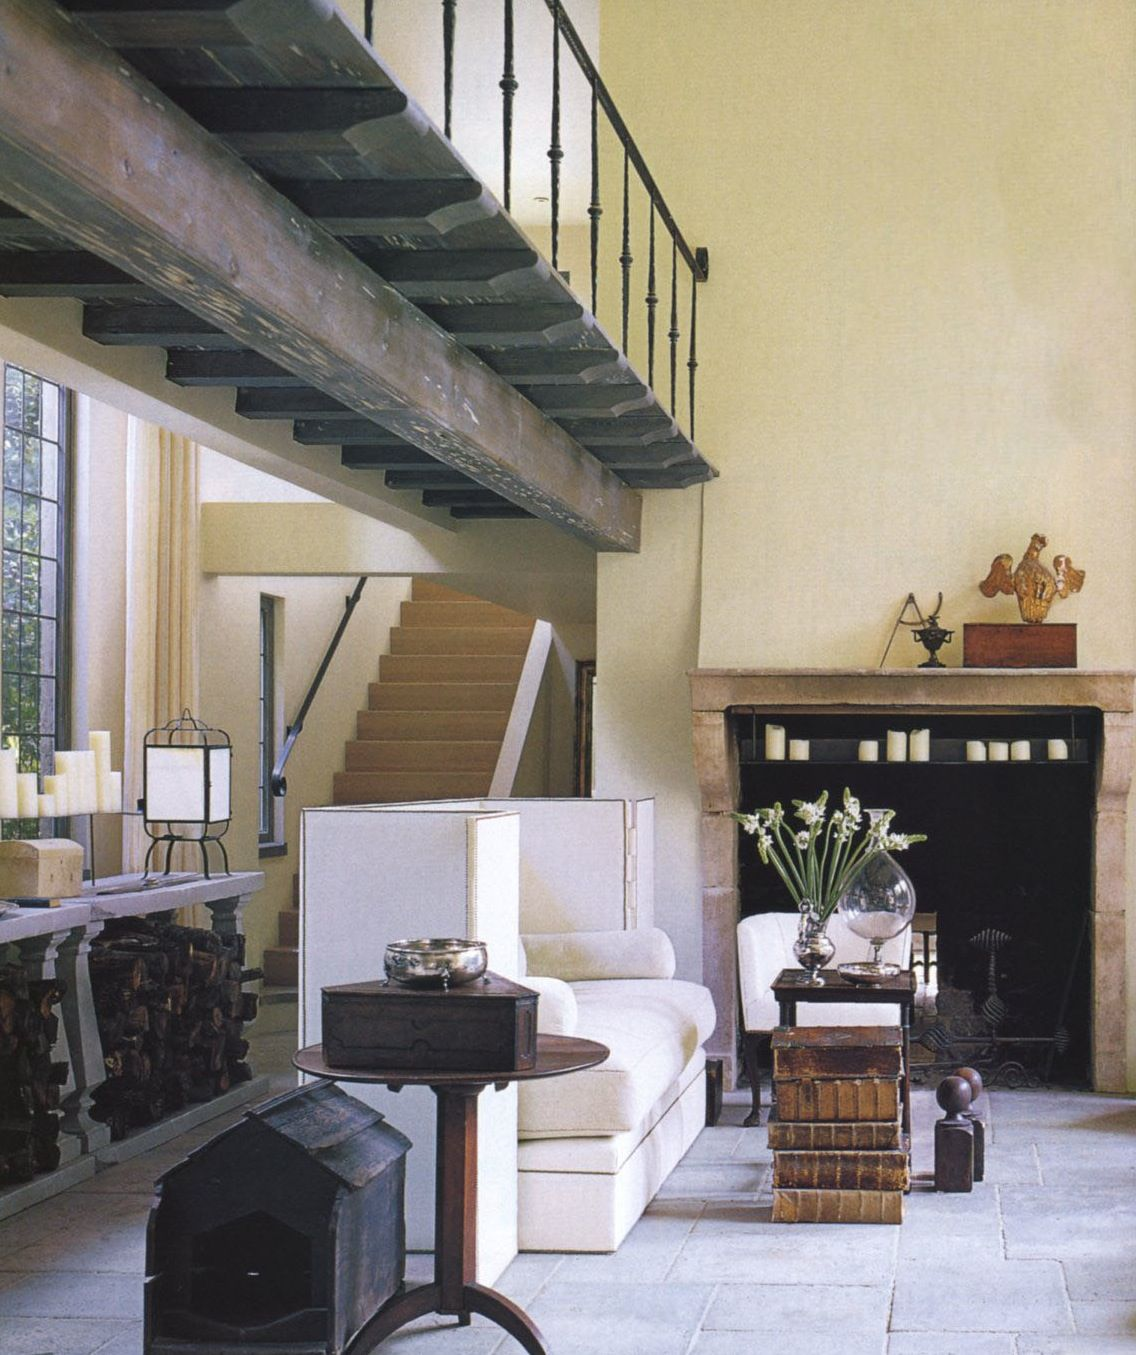 Kitchen Hearth Room Designs: RUSTIC WARMTH - BOBBY MCALPINE